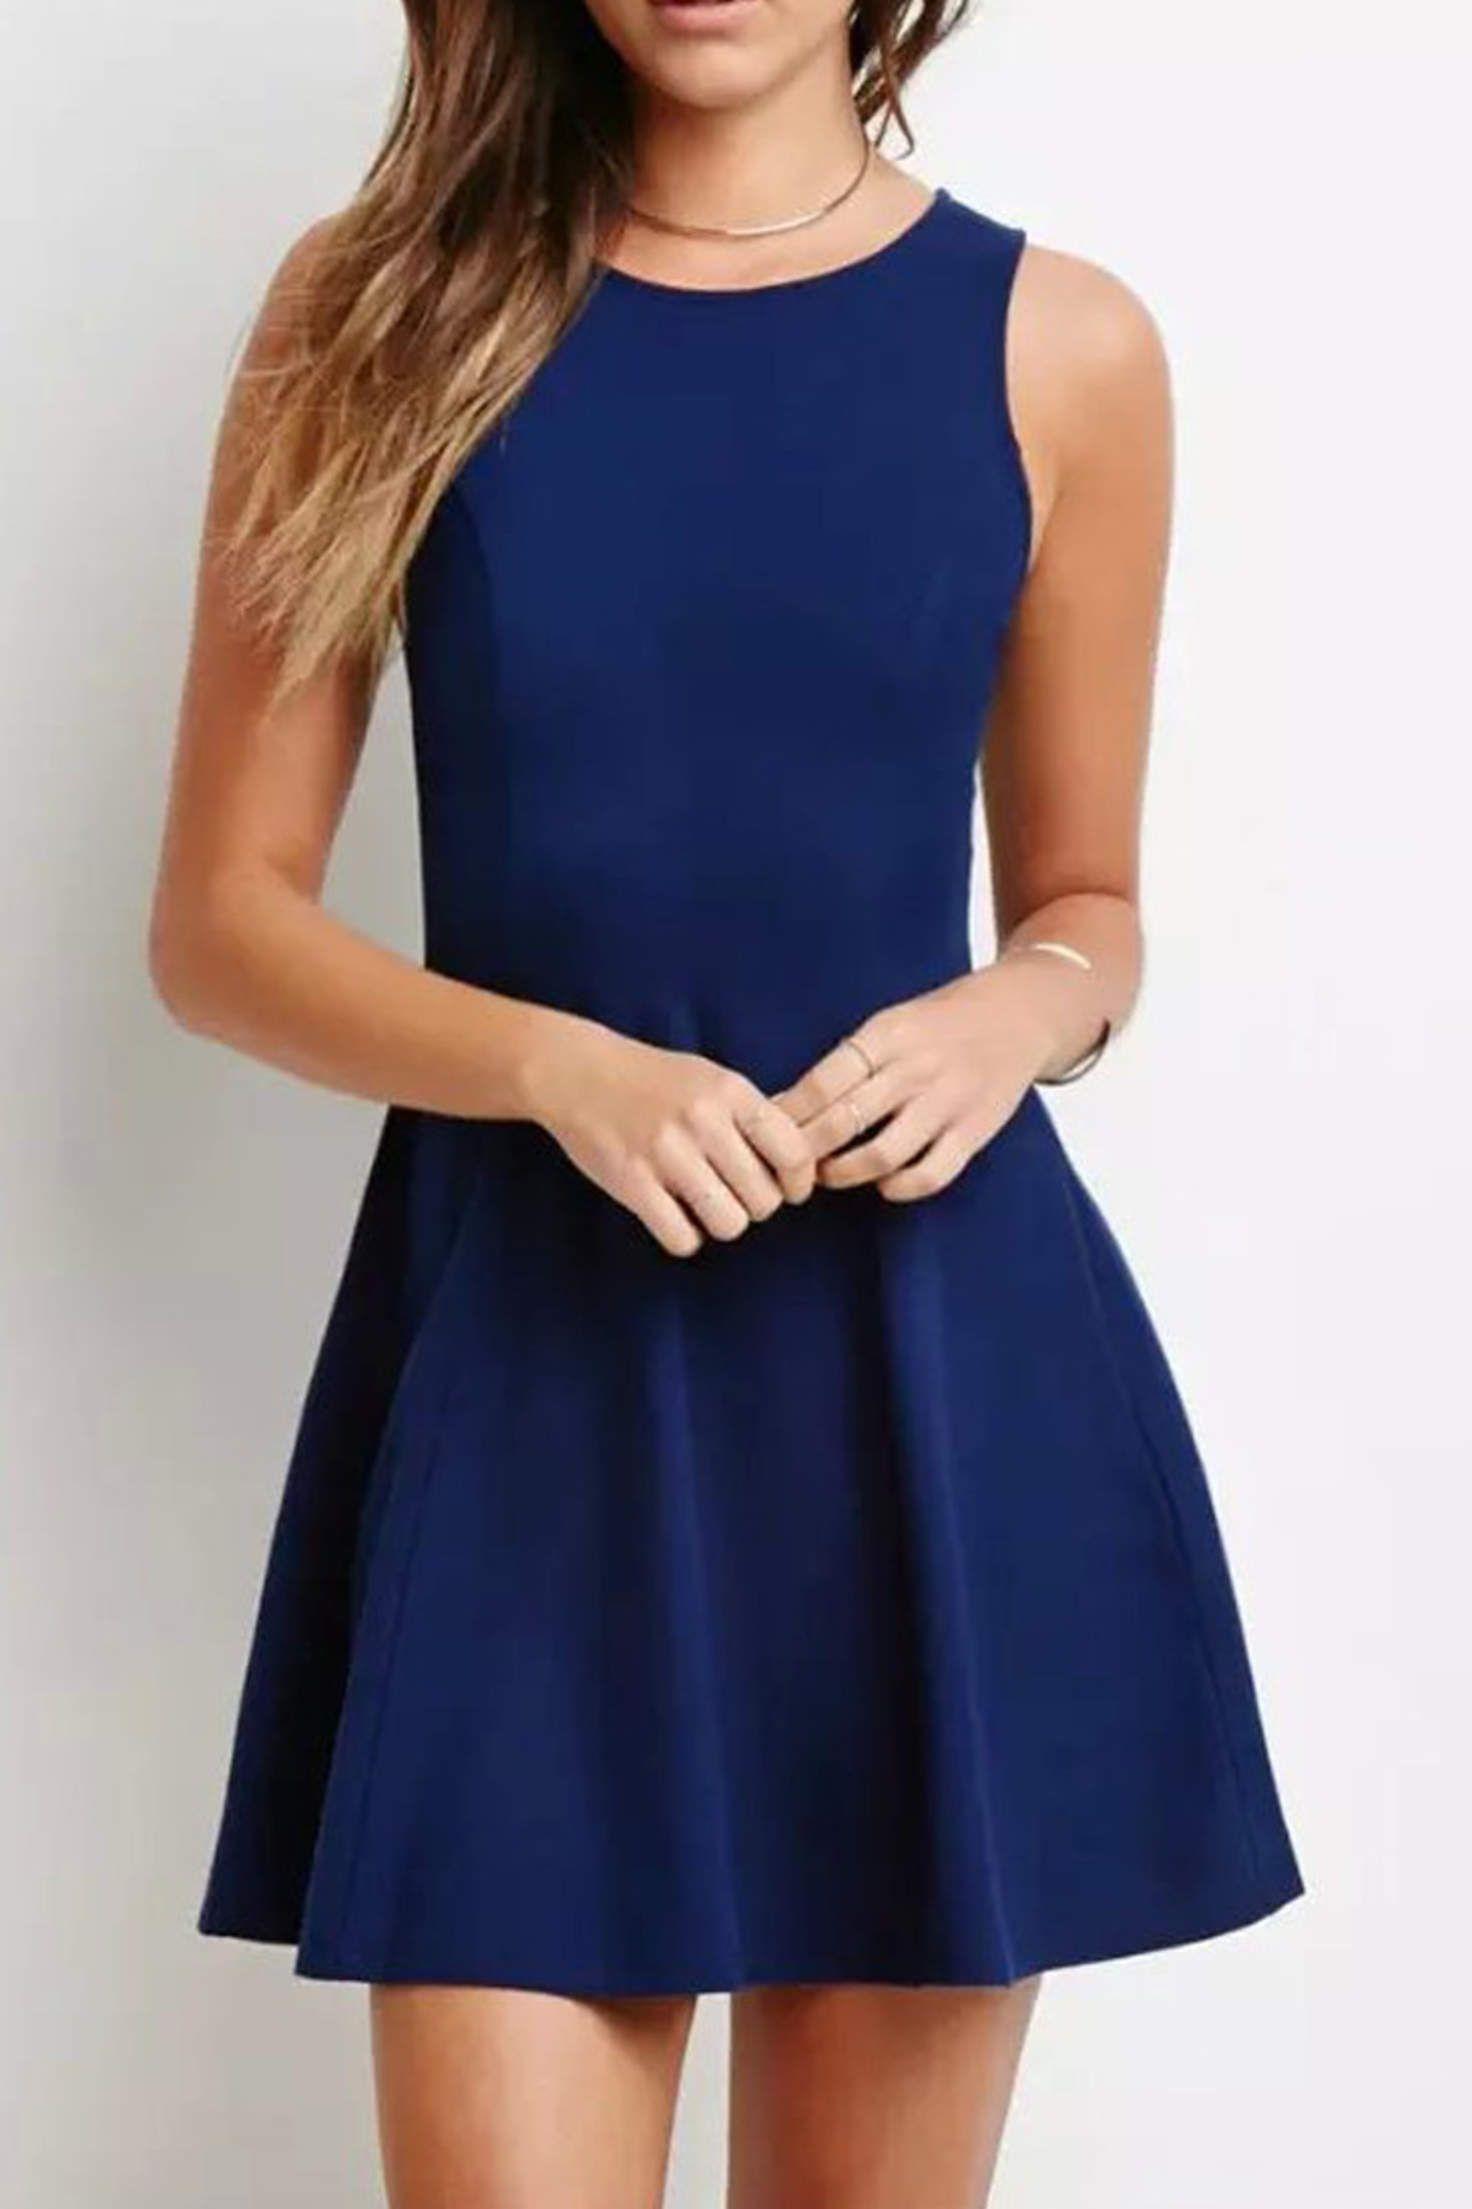 c2c4d42c30 Navy Blue Sleeveless Pleated Mini Dress